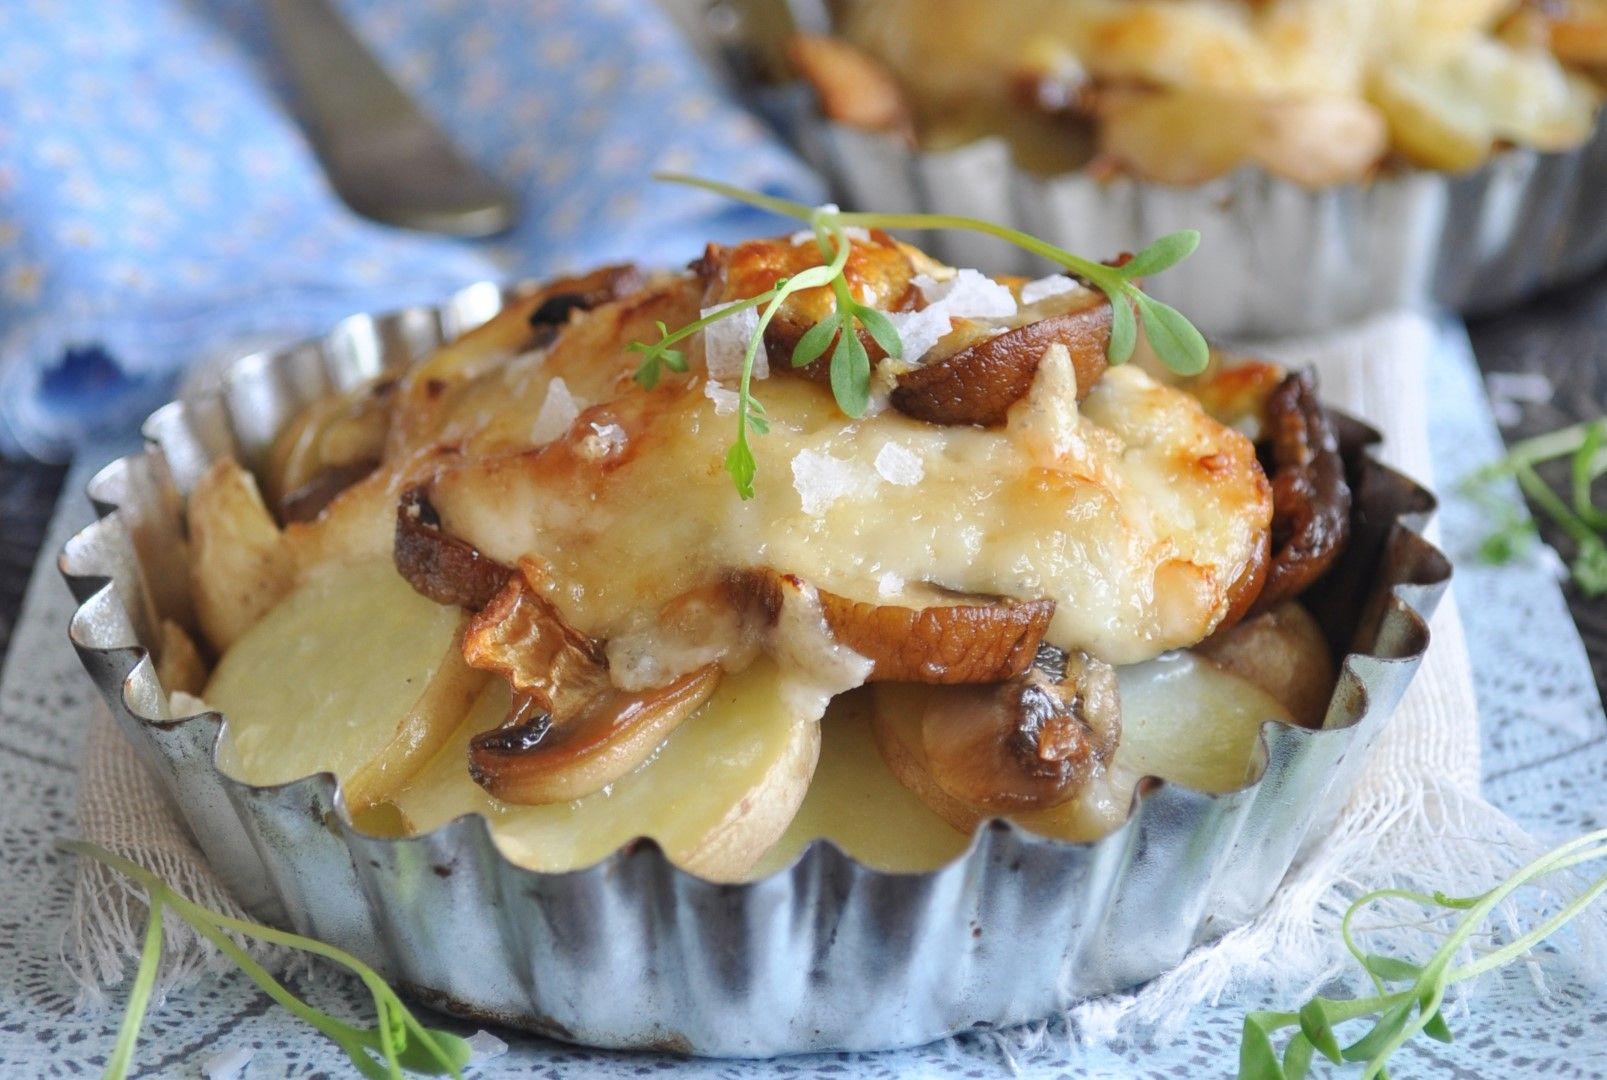 Mouthwatering mushroom and potato bake in 2020 Baking